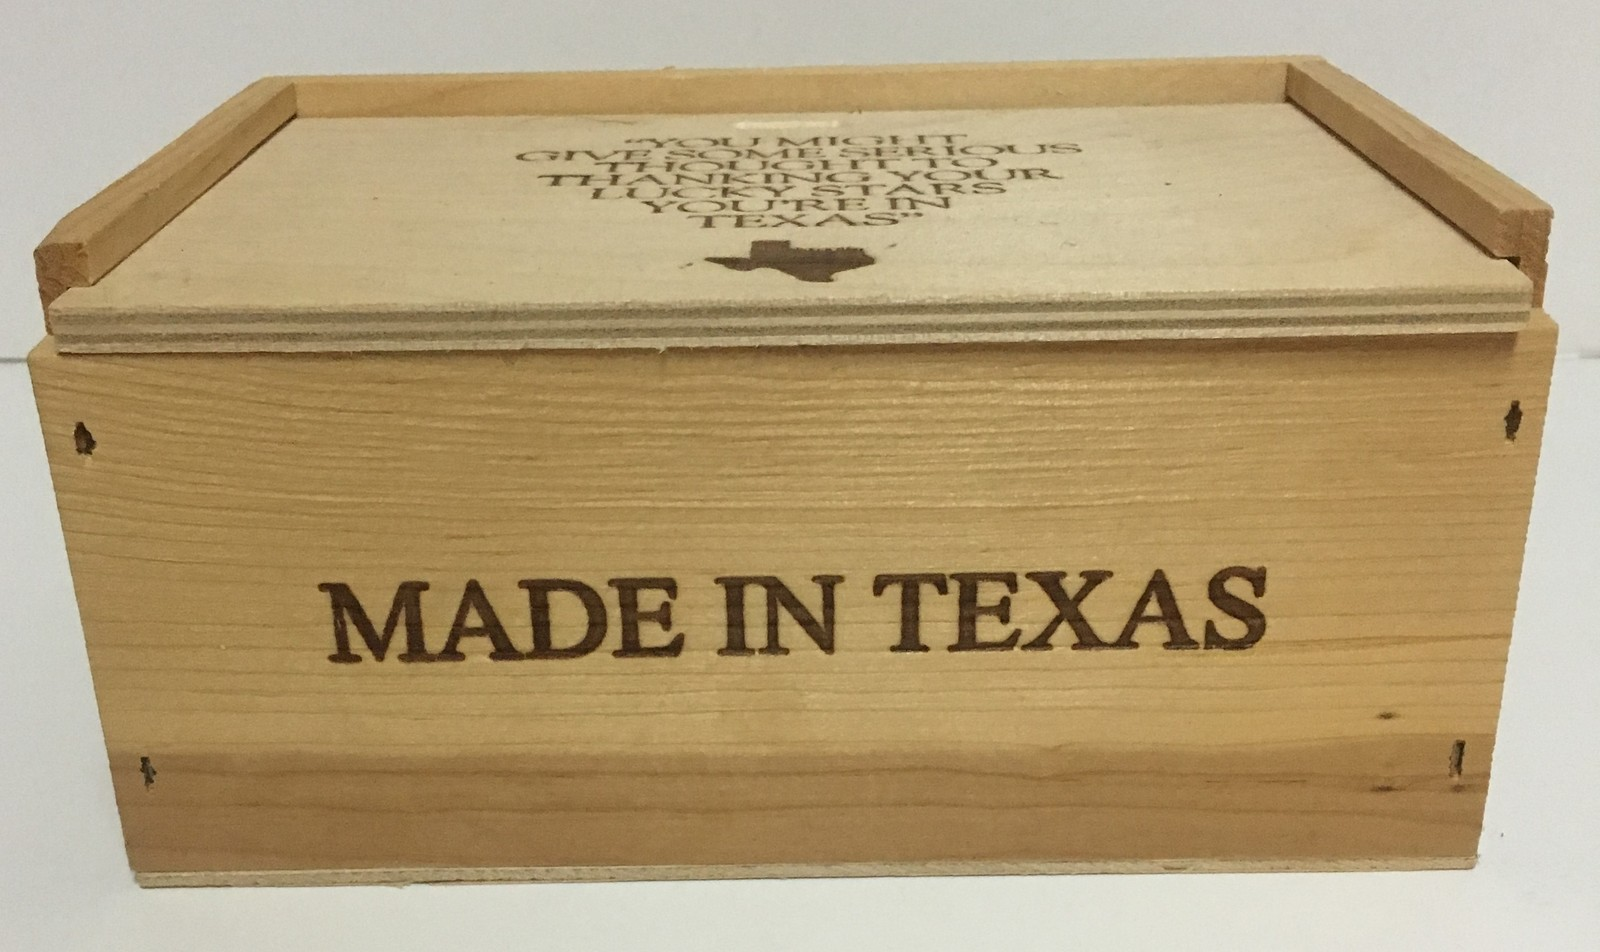 "Made in Texas Wood Pie Storage Box 8"" x 4"" Slide Lid"